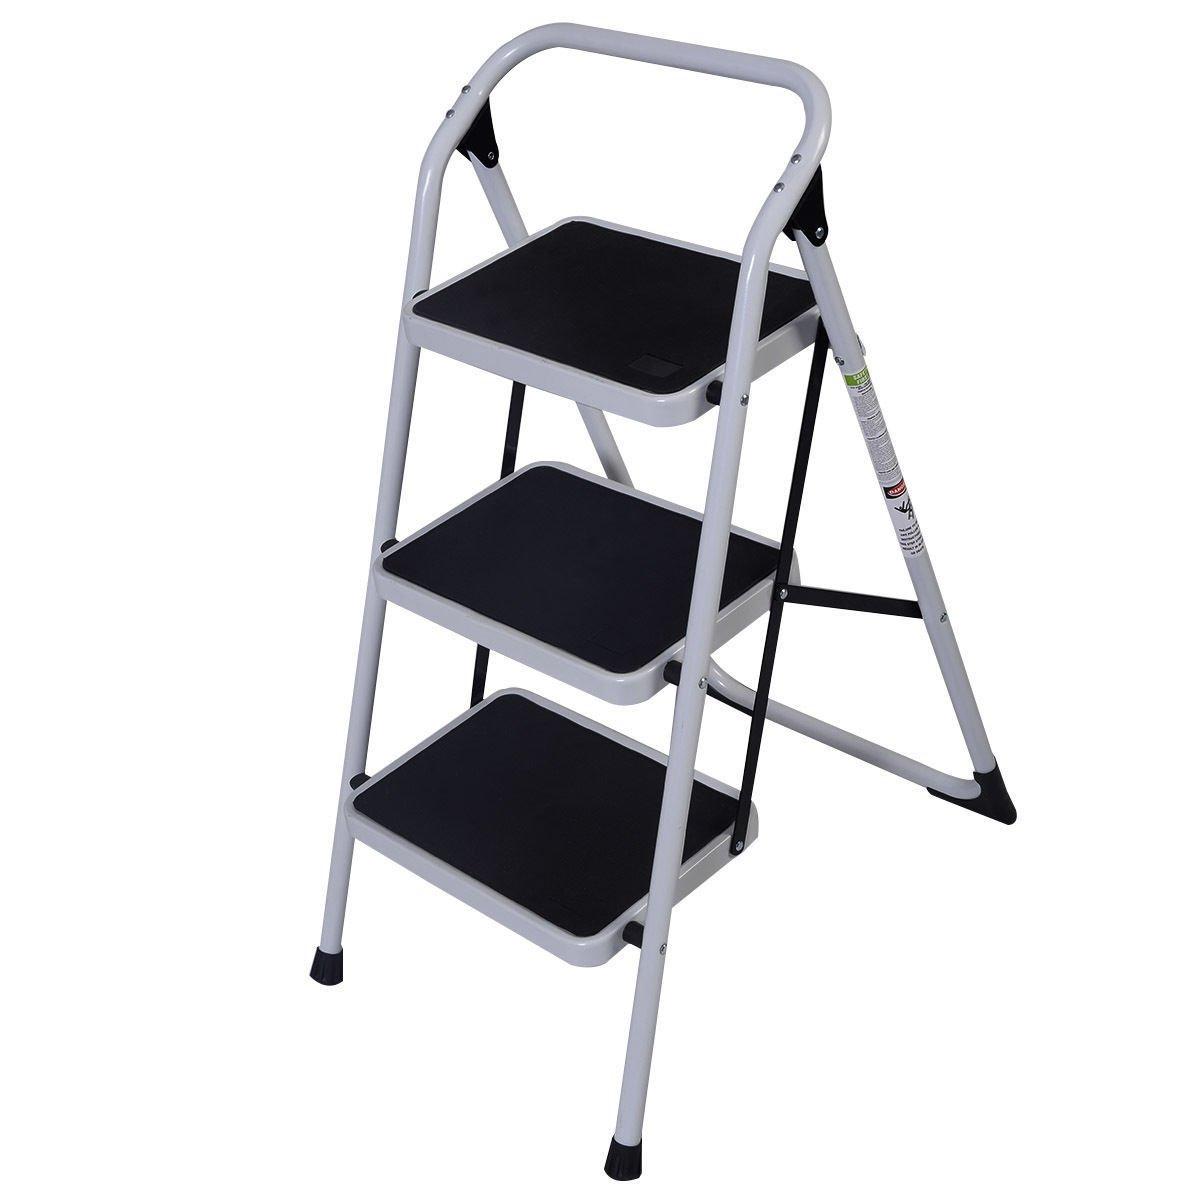 New HD 3 Step Ladder Platform Lightweight Folding Stool 330 LB Cap Space Saving